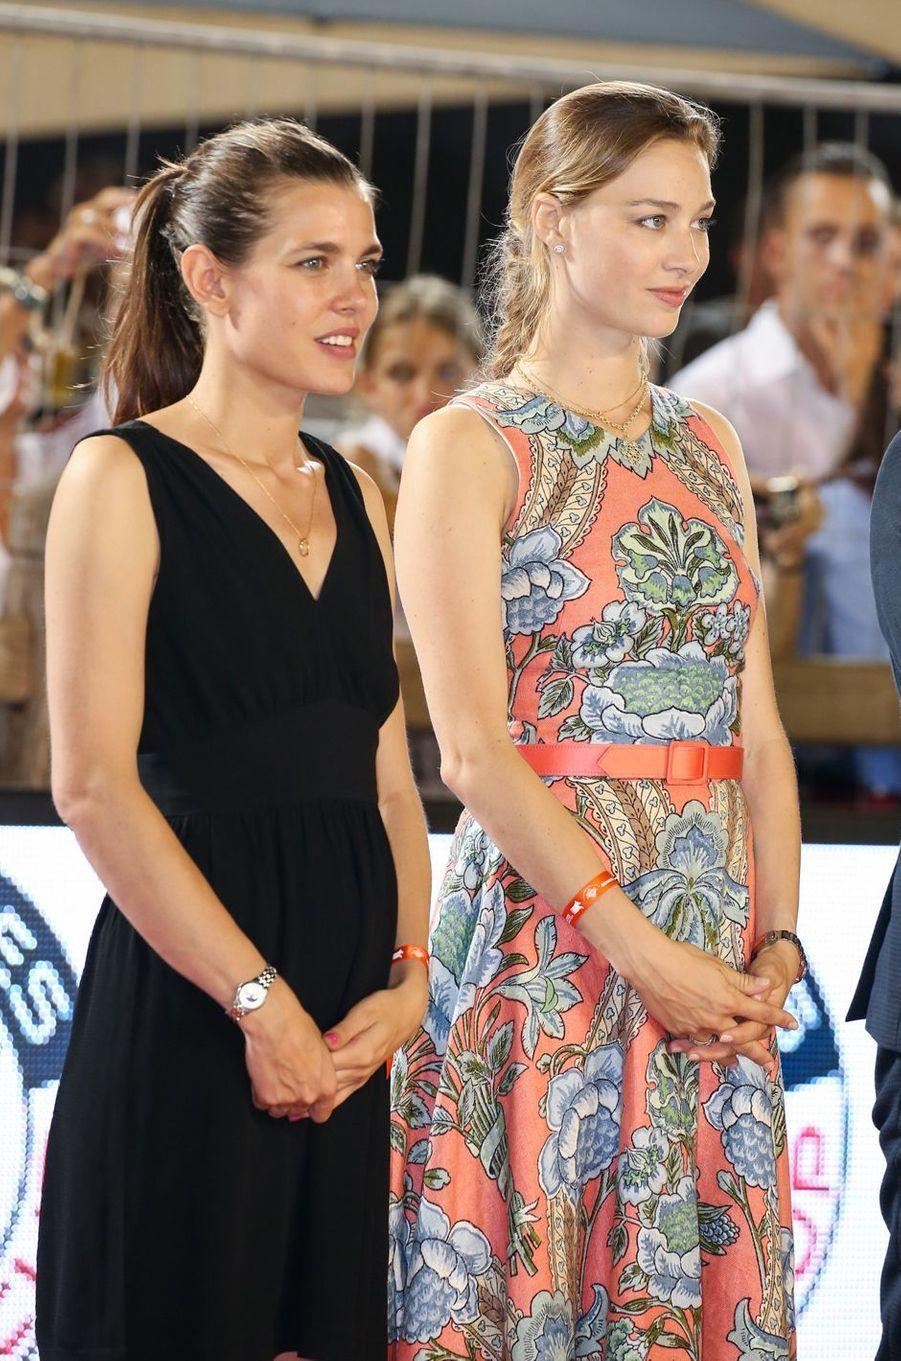 Charlotte Casiraghi et Beatrice Borromeo à Monaco, le 23 juin 2017